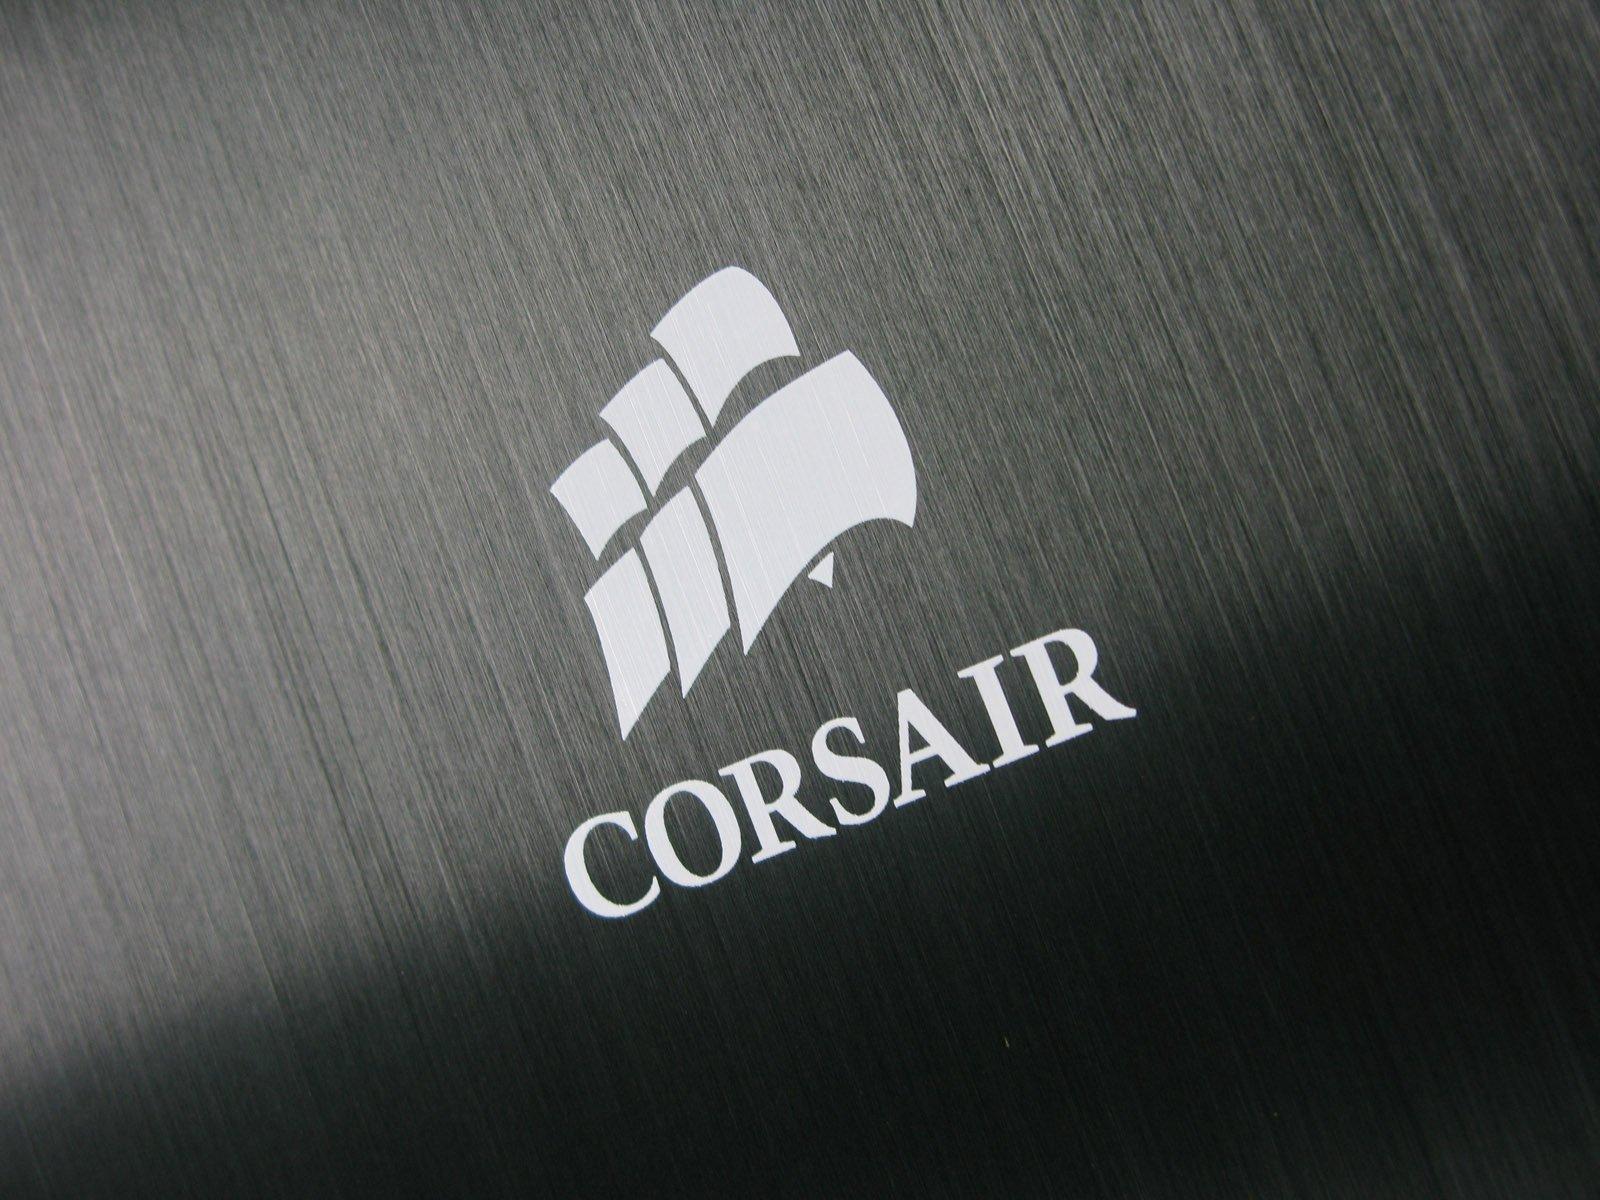 corsair wallpaper 1440p - photo #22